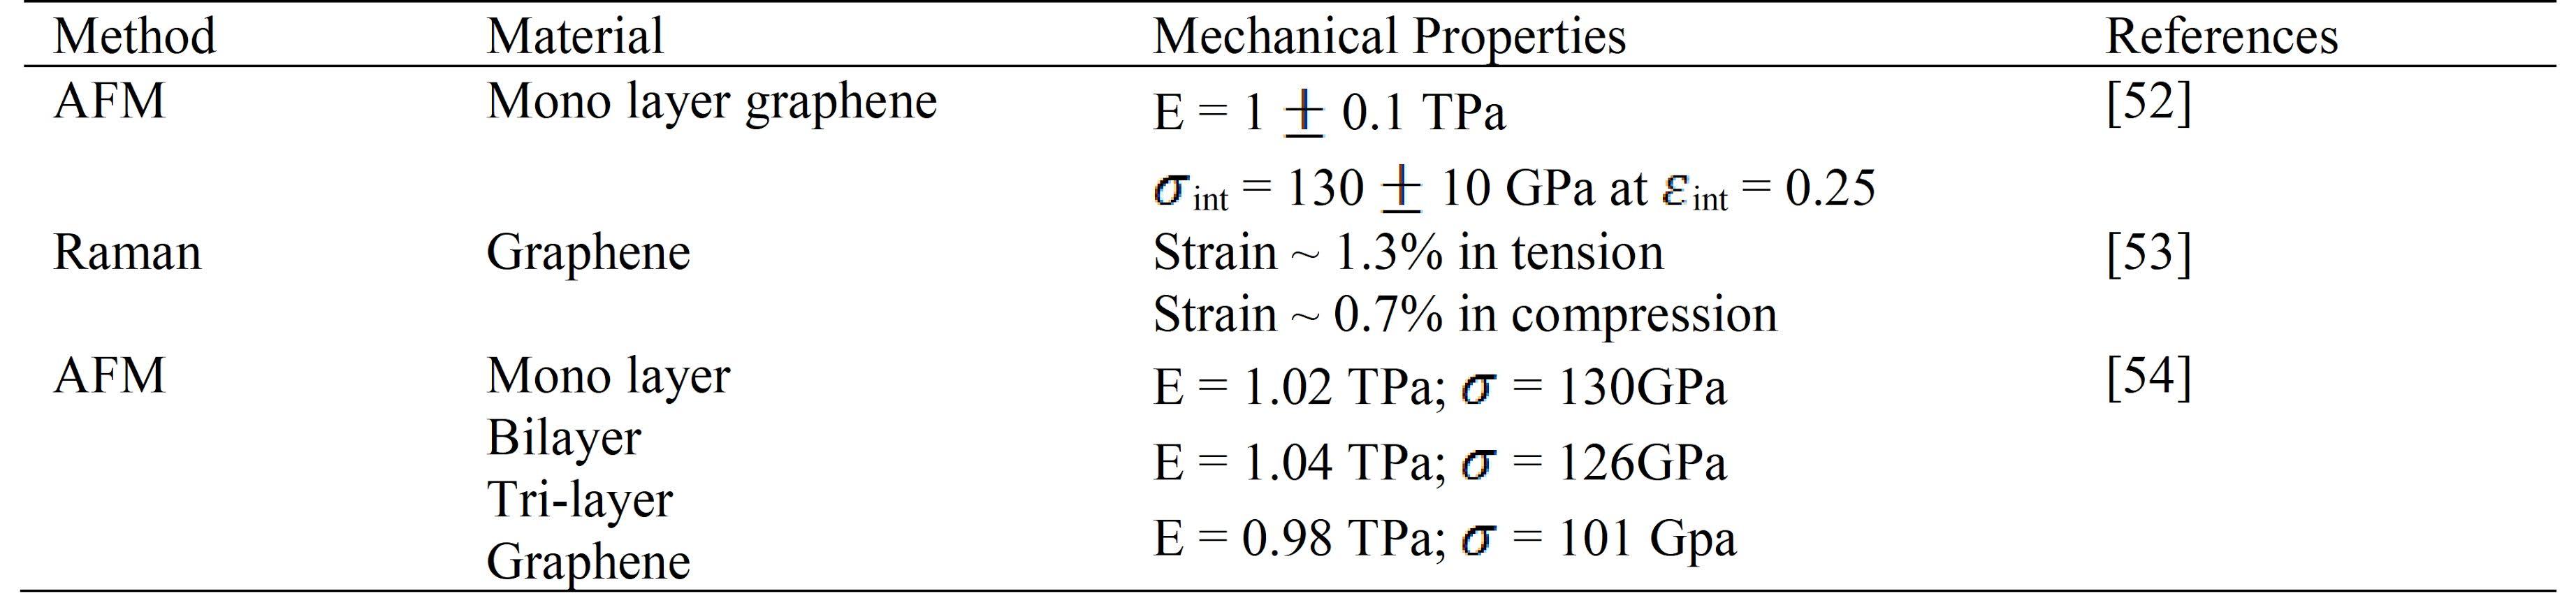 Mechanical Properties of Graphene